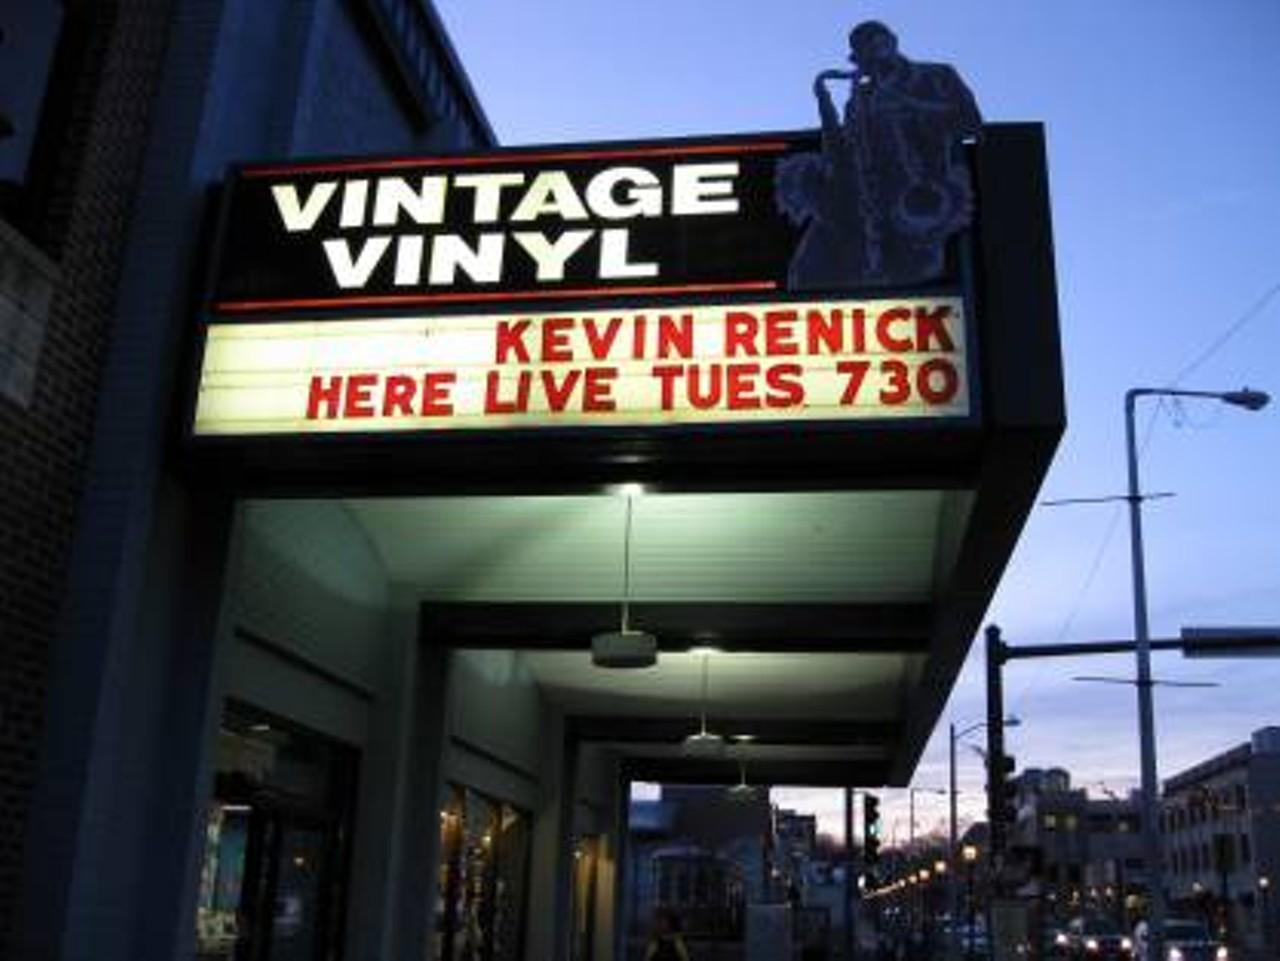 Vintage Vinyl Delmar The Loop Retail Music Venues